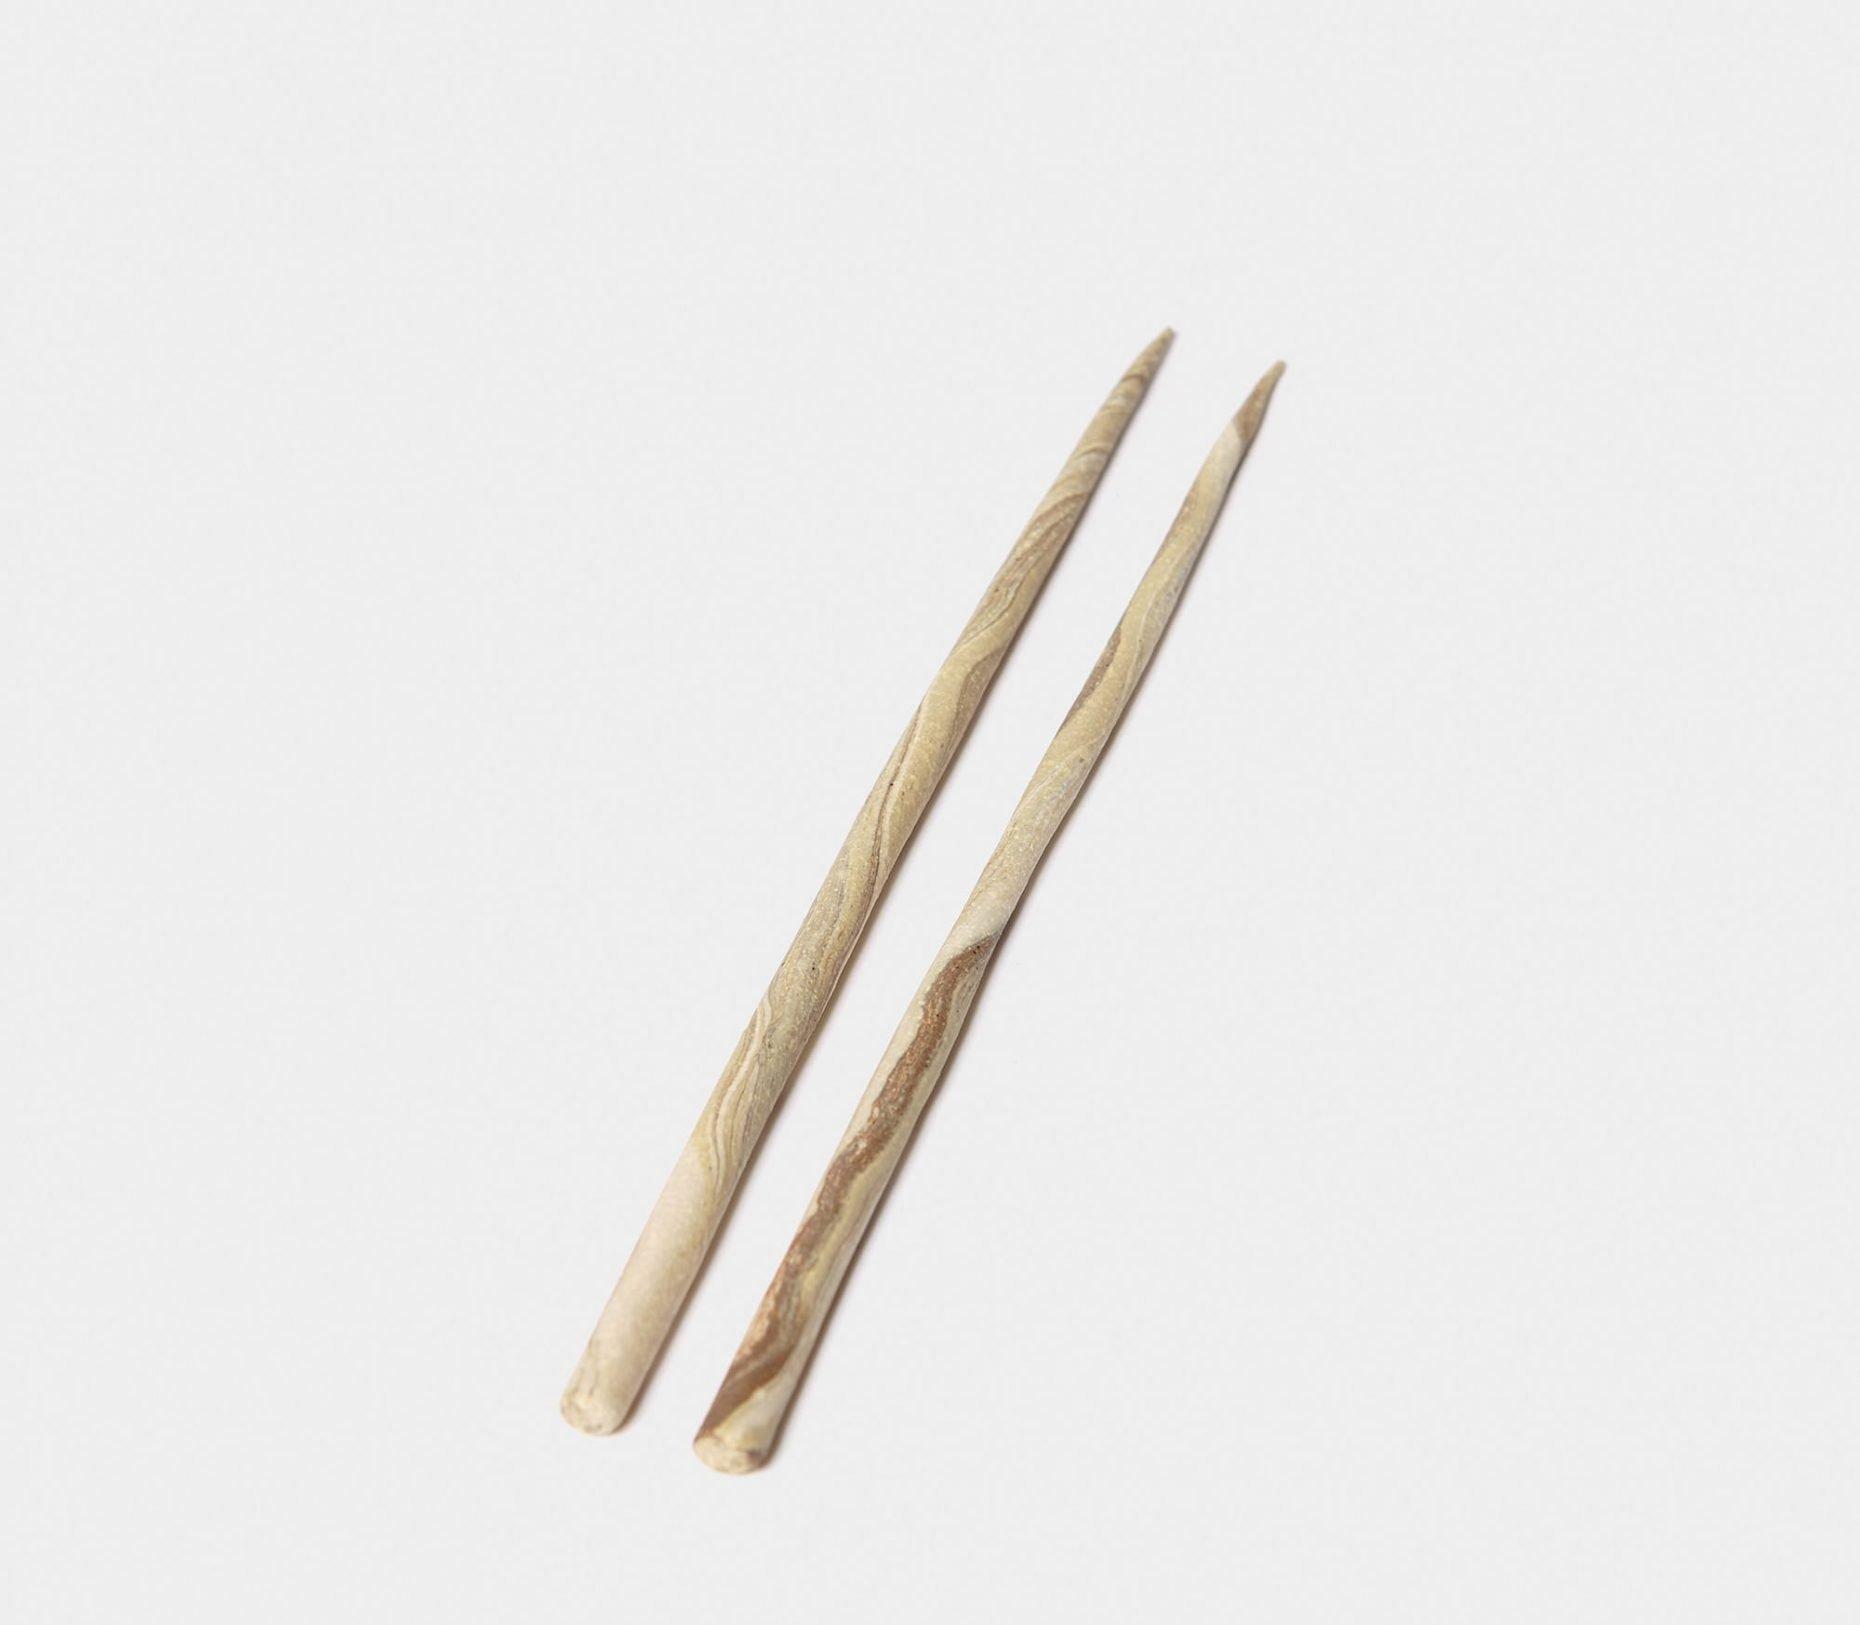 Kana Marbled Chopsticks